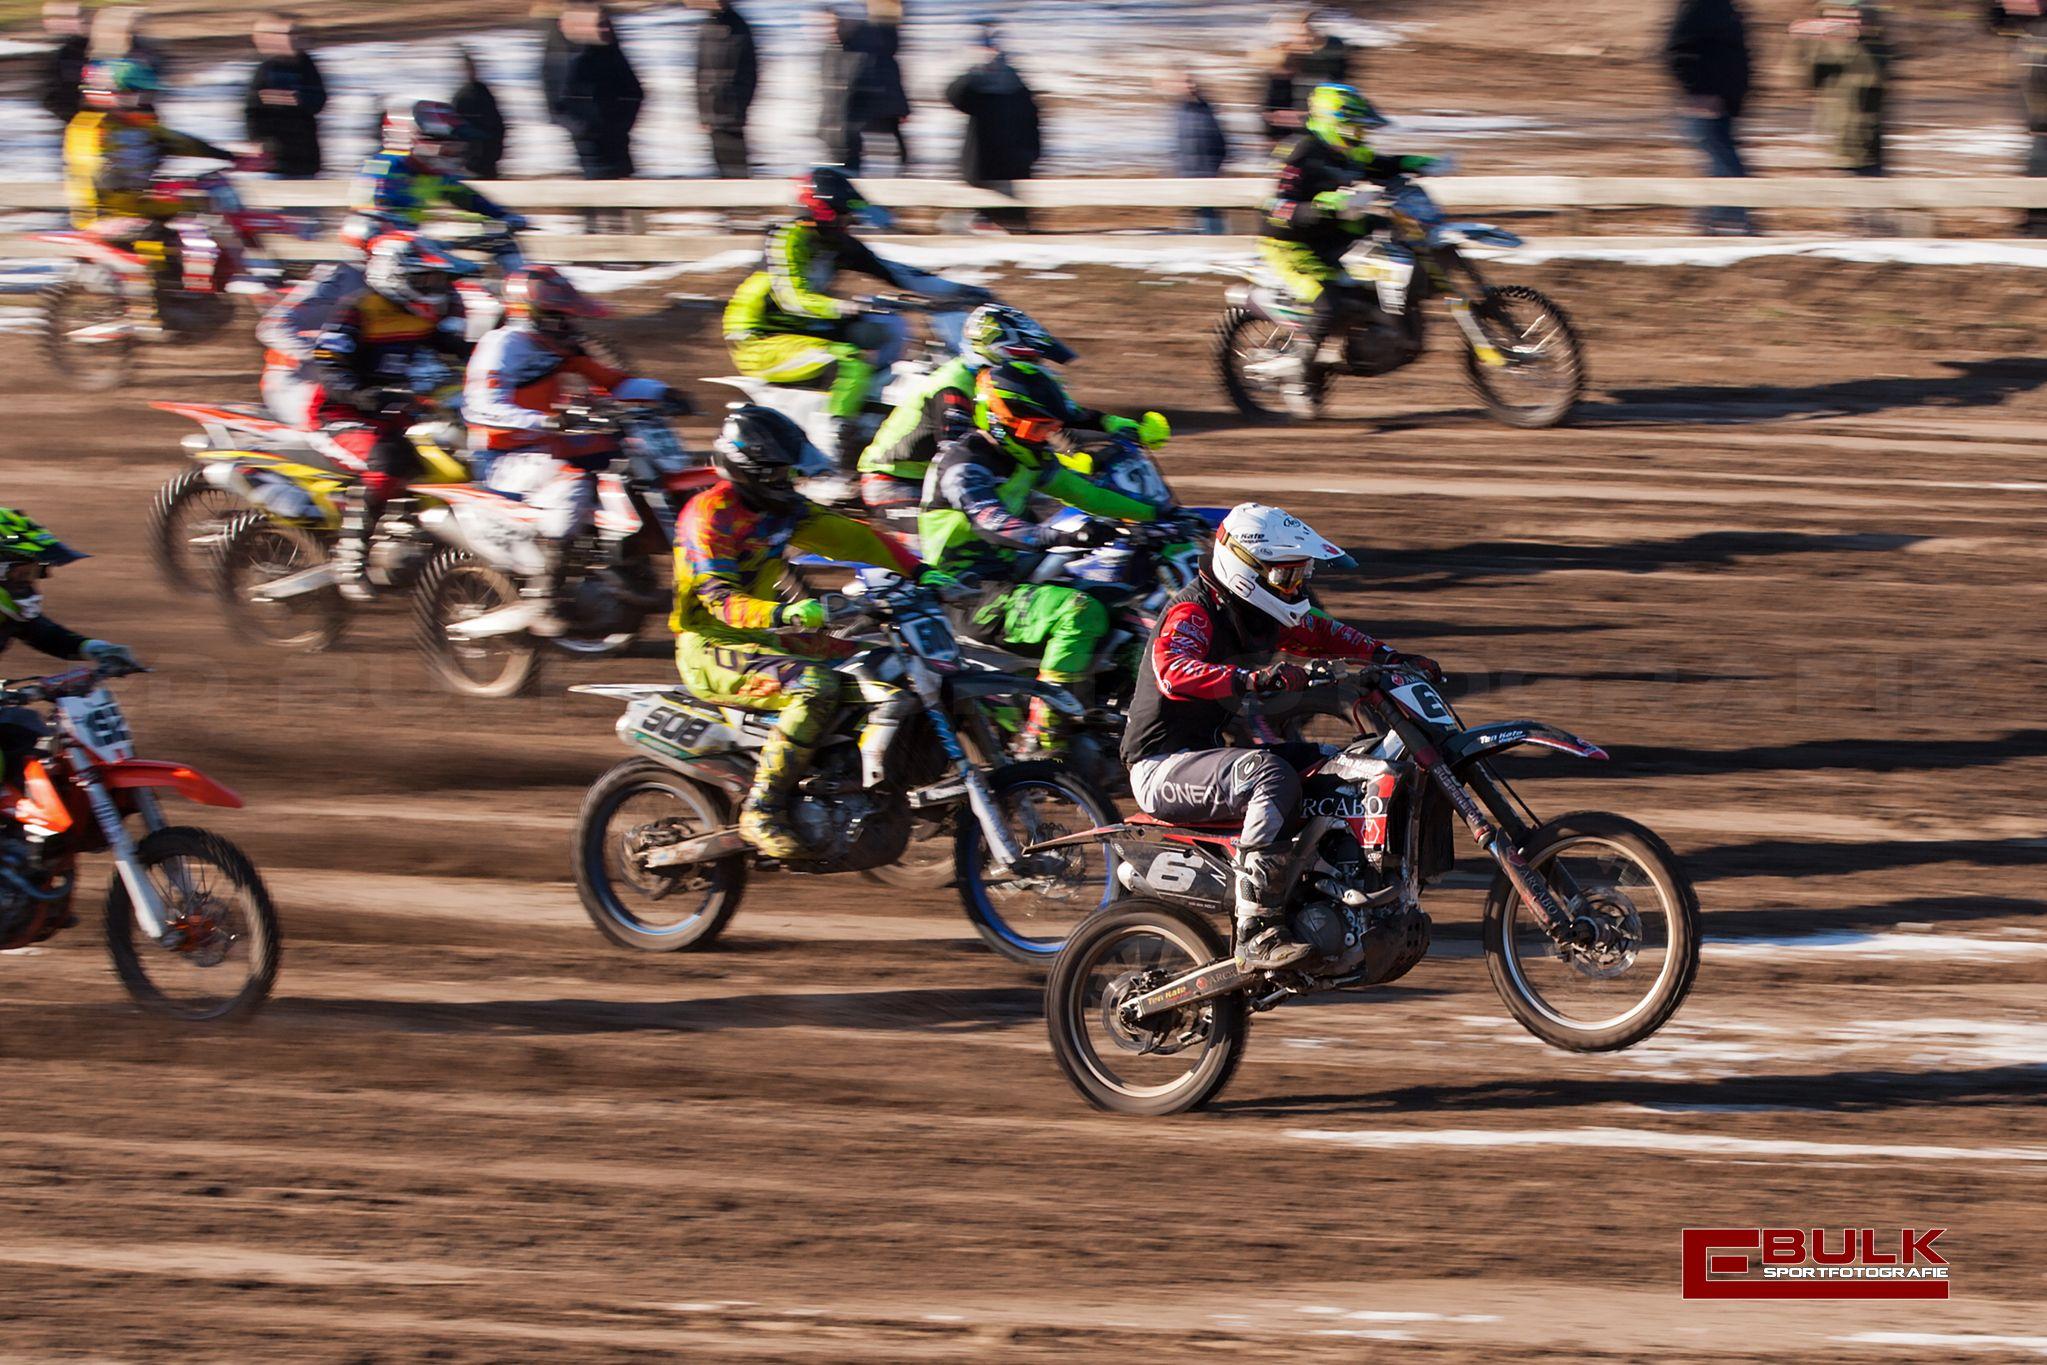 ebs_0572-ed_bulk_sportfotografie